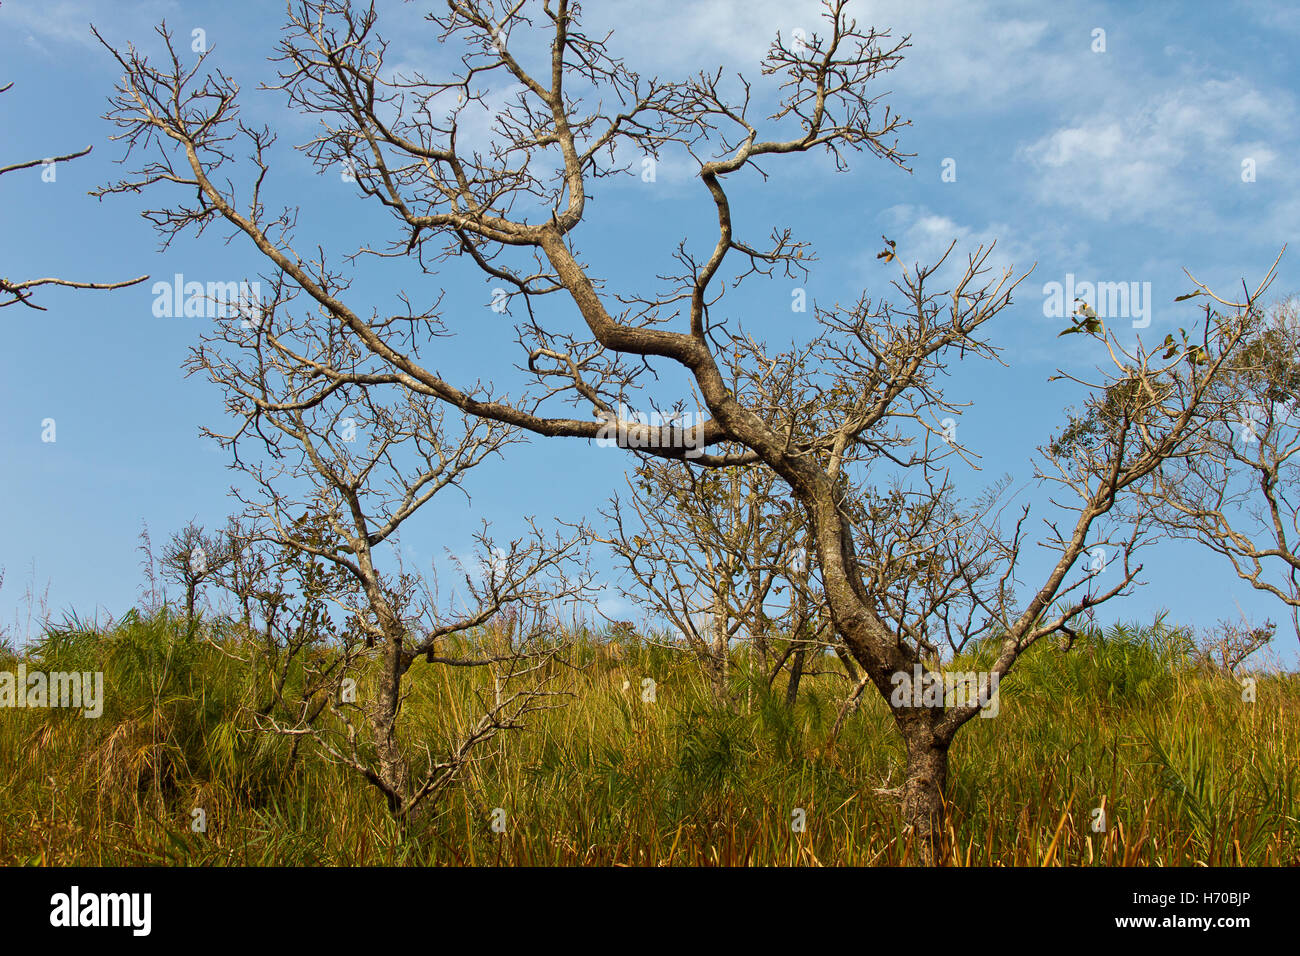 Leafless tree on grassy land against blue sky - Stock Image